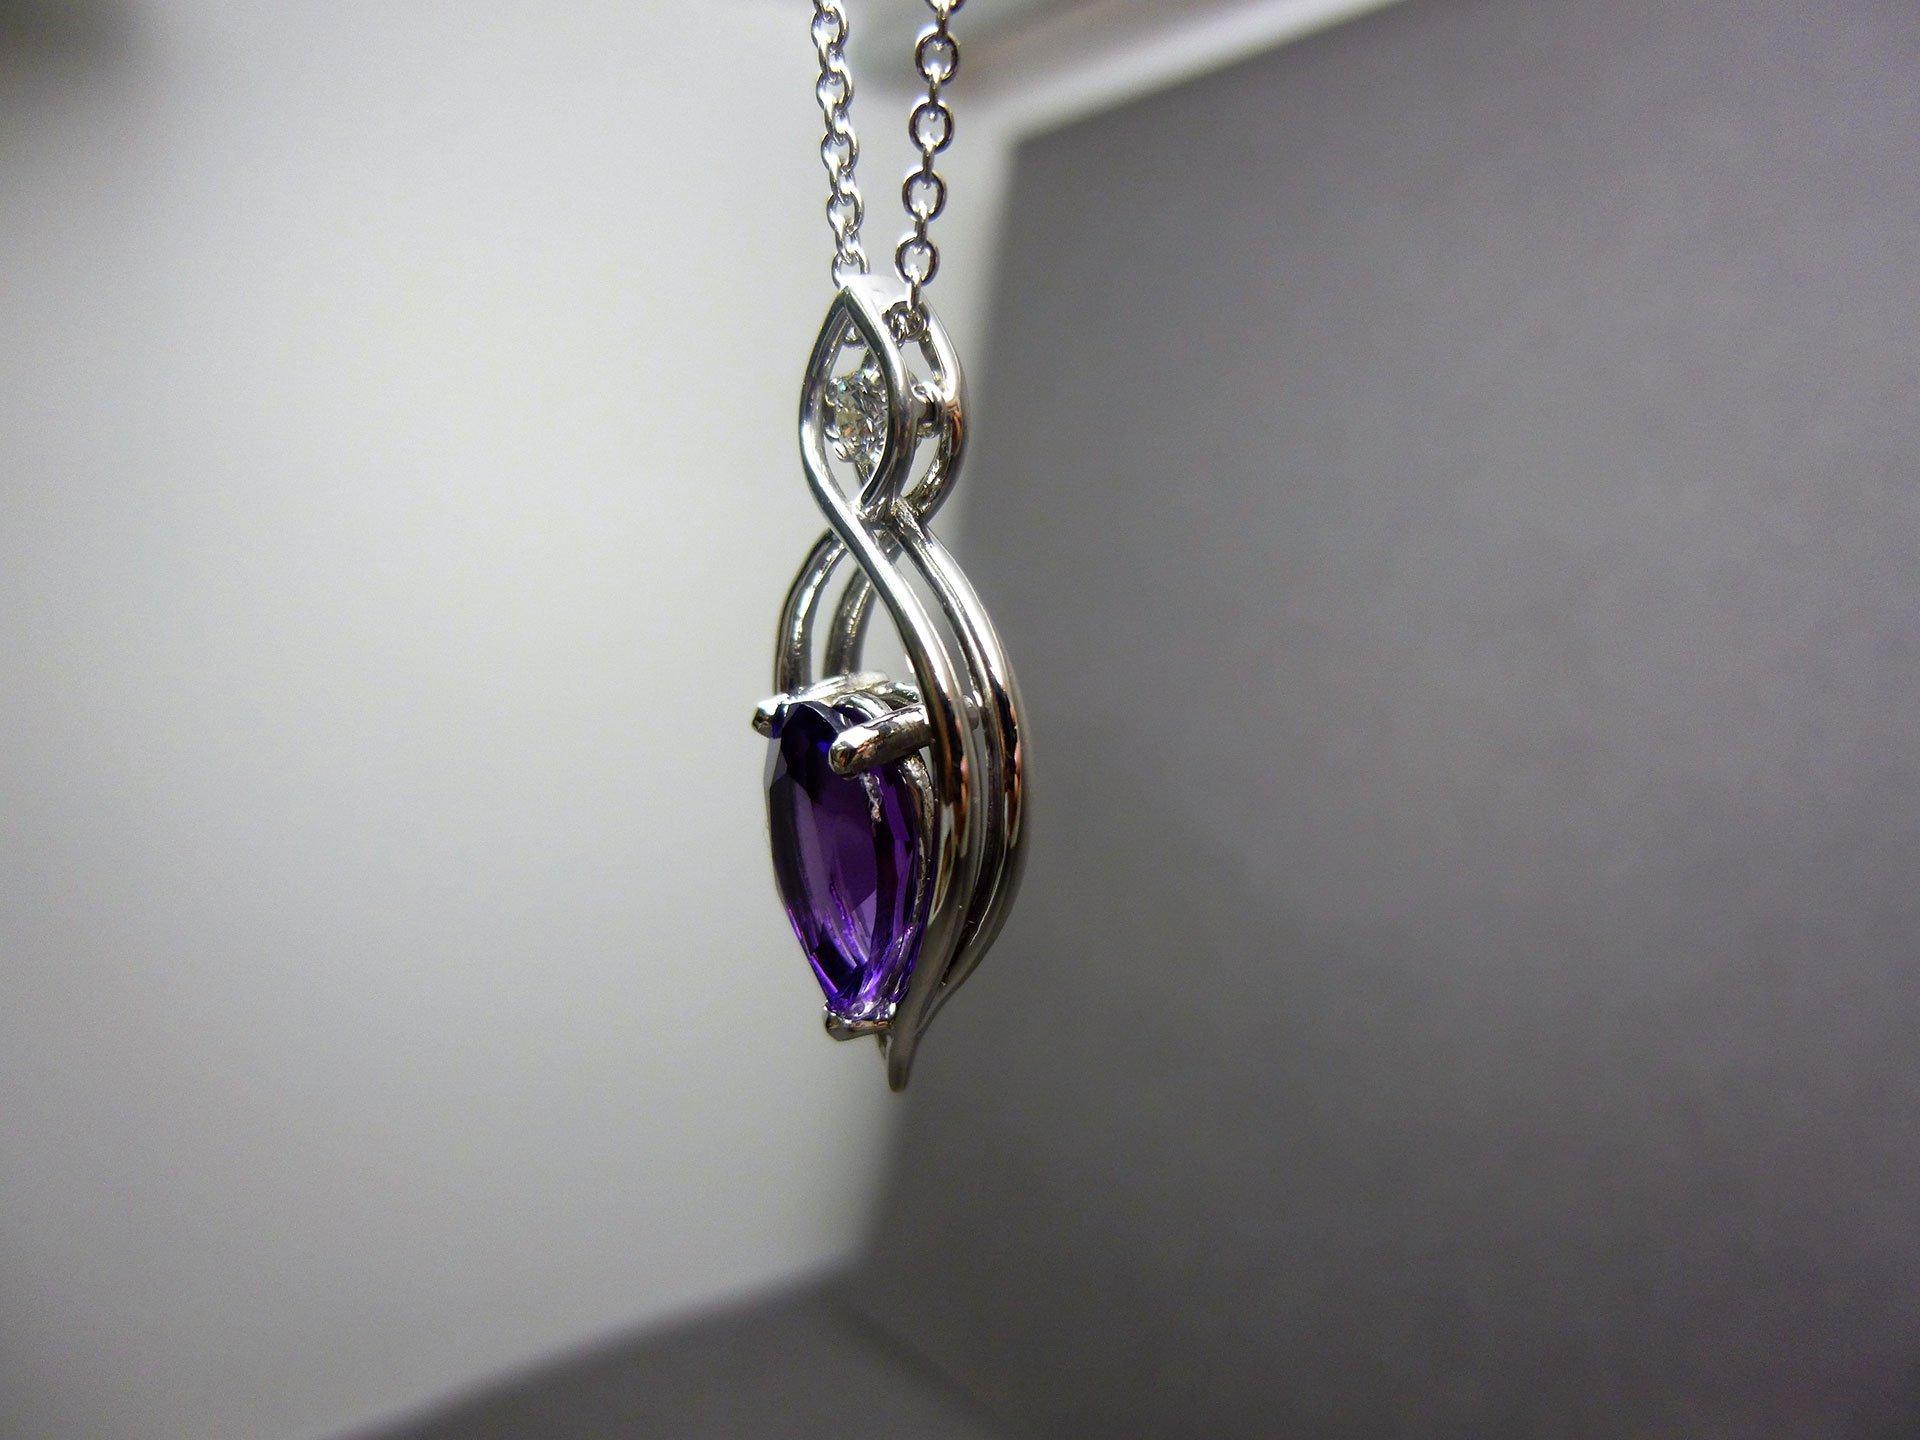 An amethyst and diamond pendant hanging